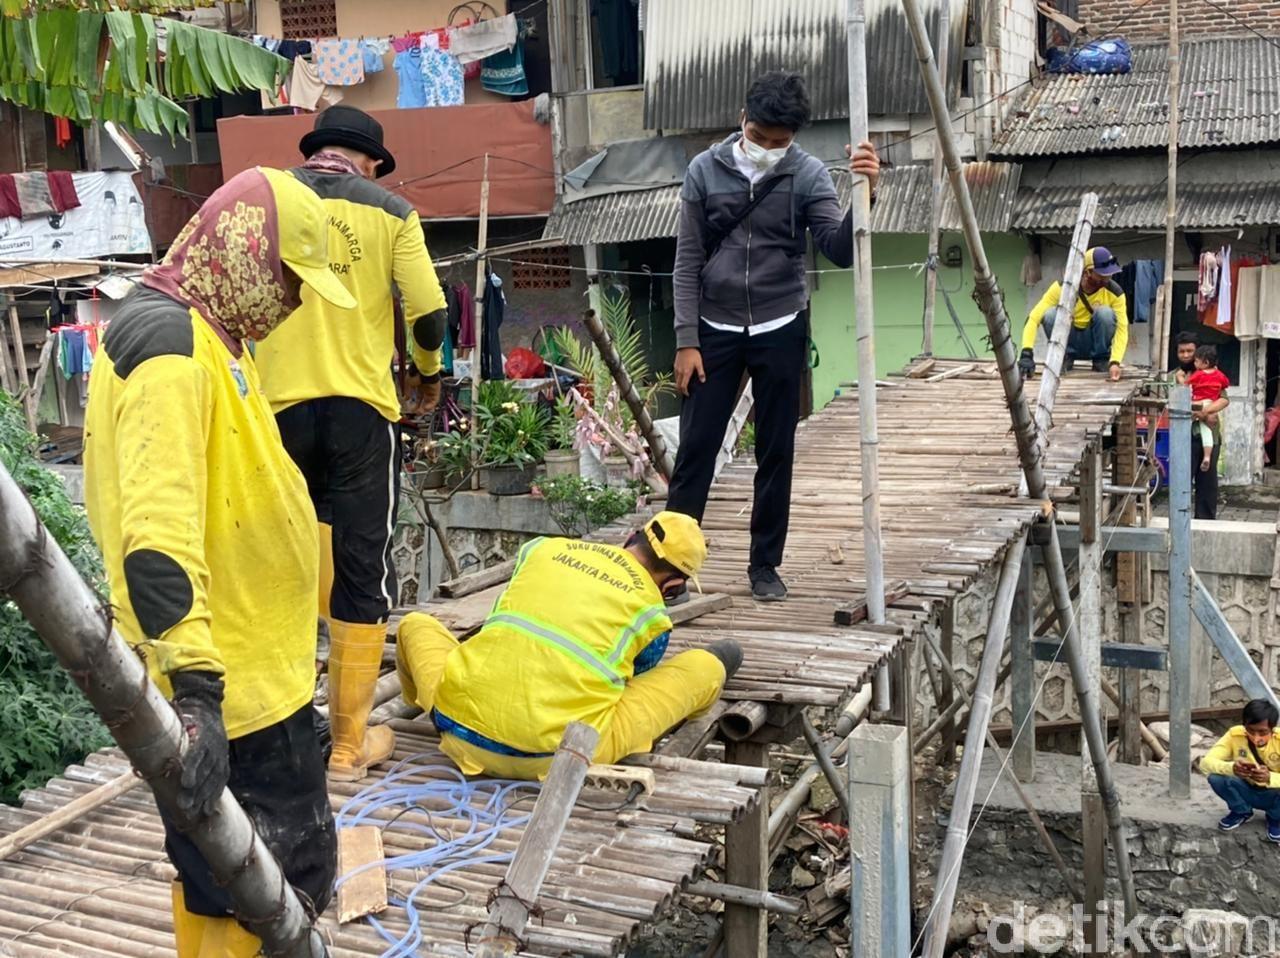 Jembatan bambu reyot di Kebon Jeruk mulai dibongkar, 18 Juni 2021. (Annisa Rizky Fadhila/detikcom)